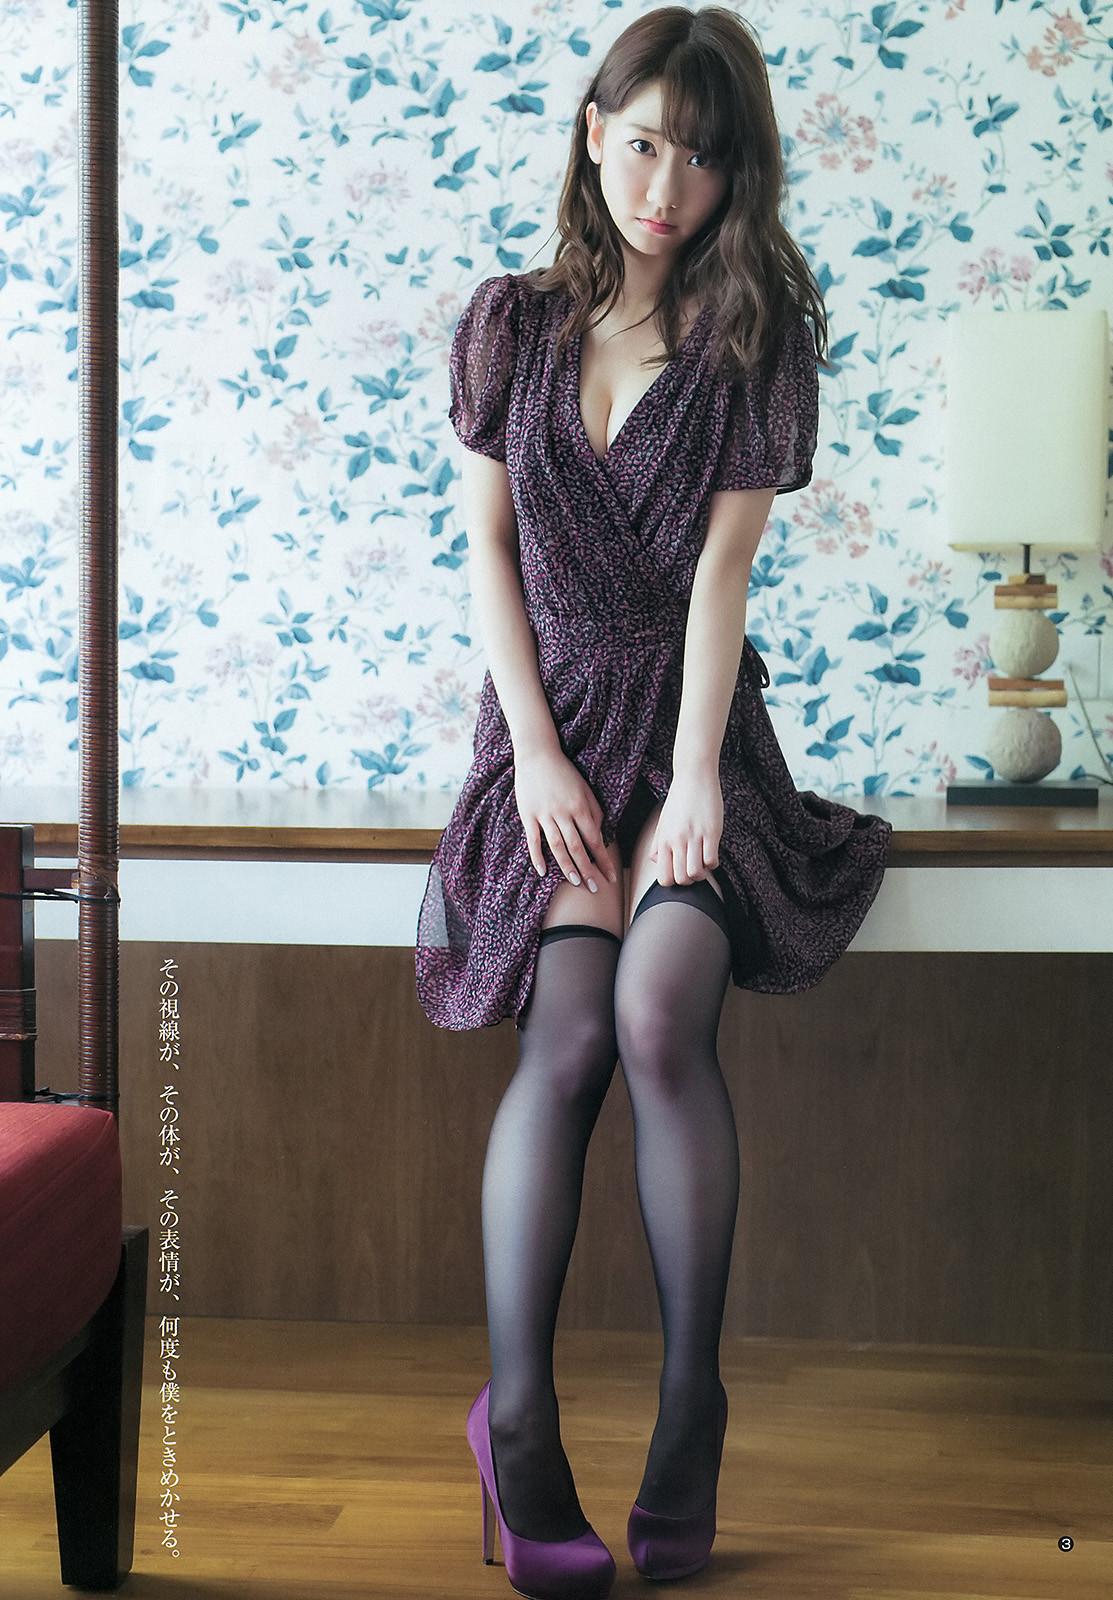 Kashiwagi Yuki 「Weekly Young Jump」 No.21 22 2015